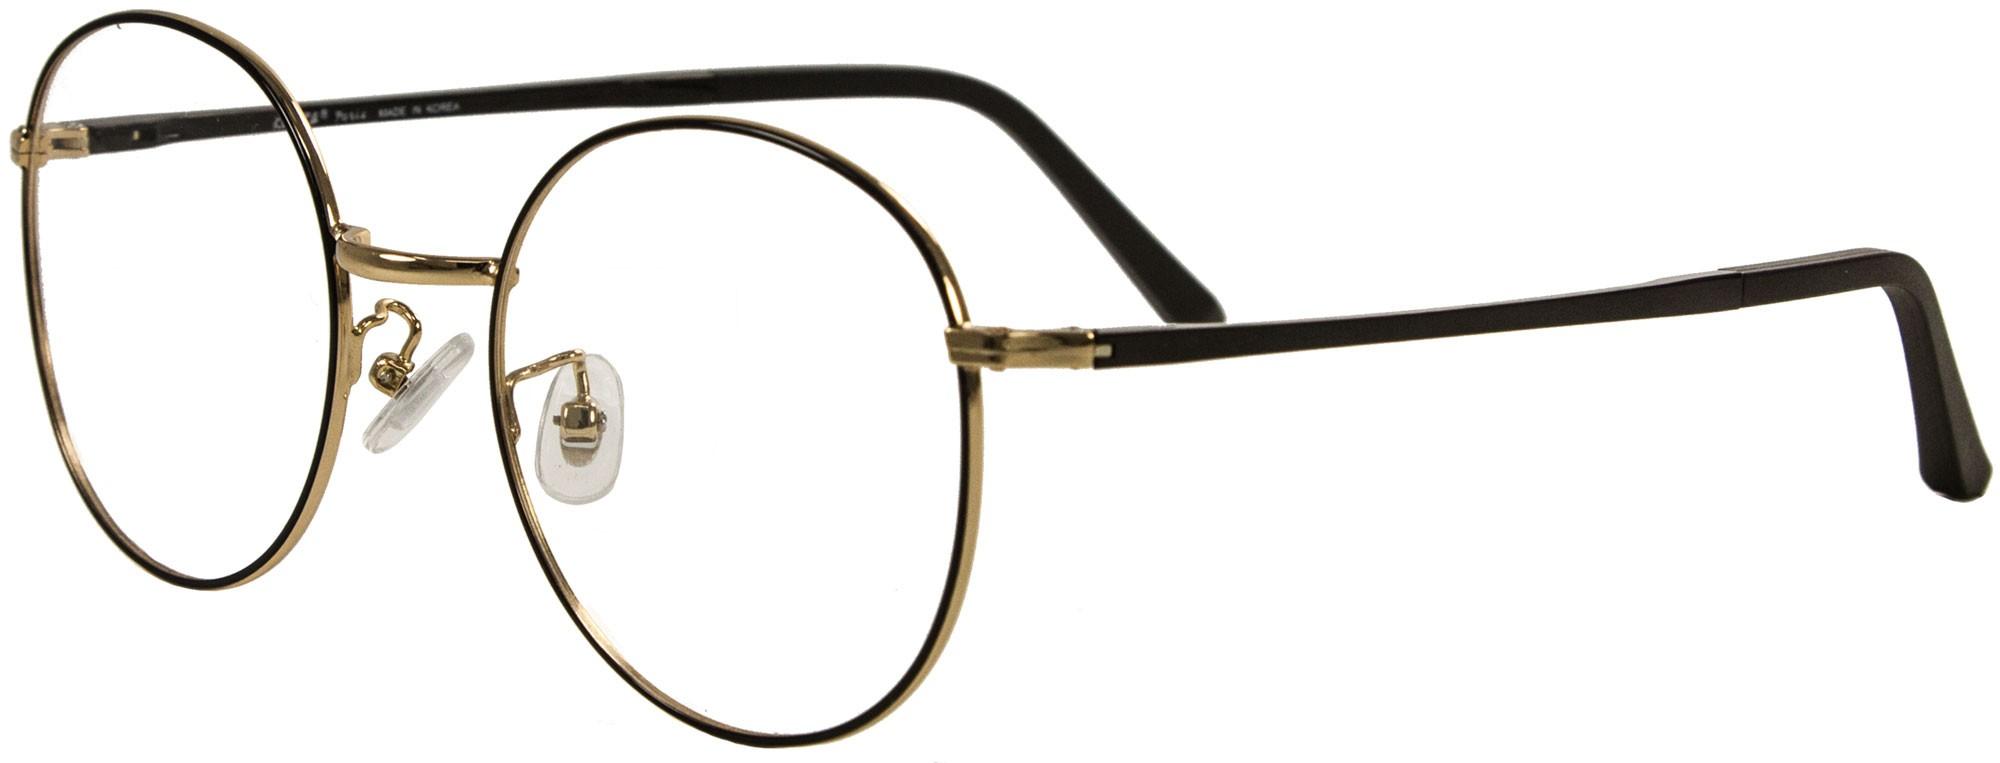 Karra 3168 Shiny Black/Gold 2